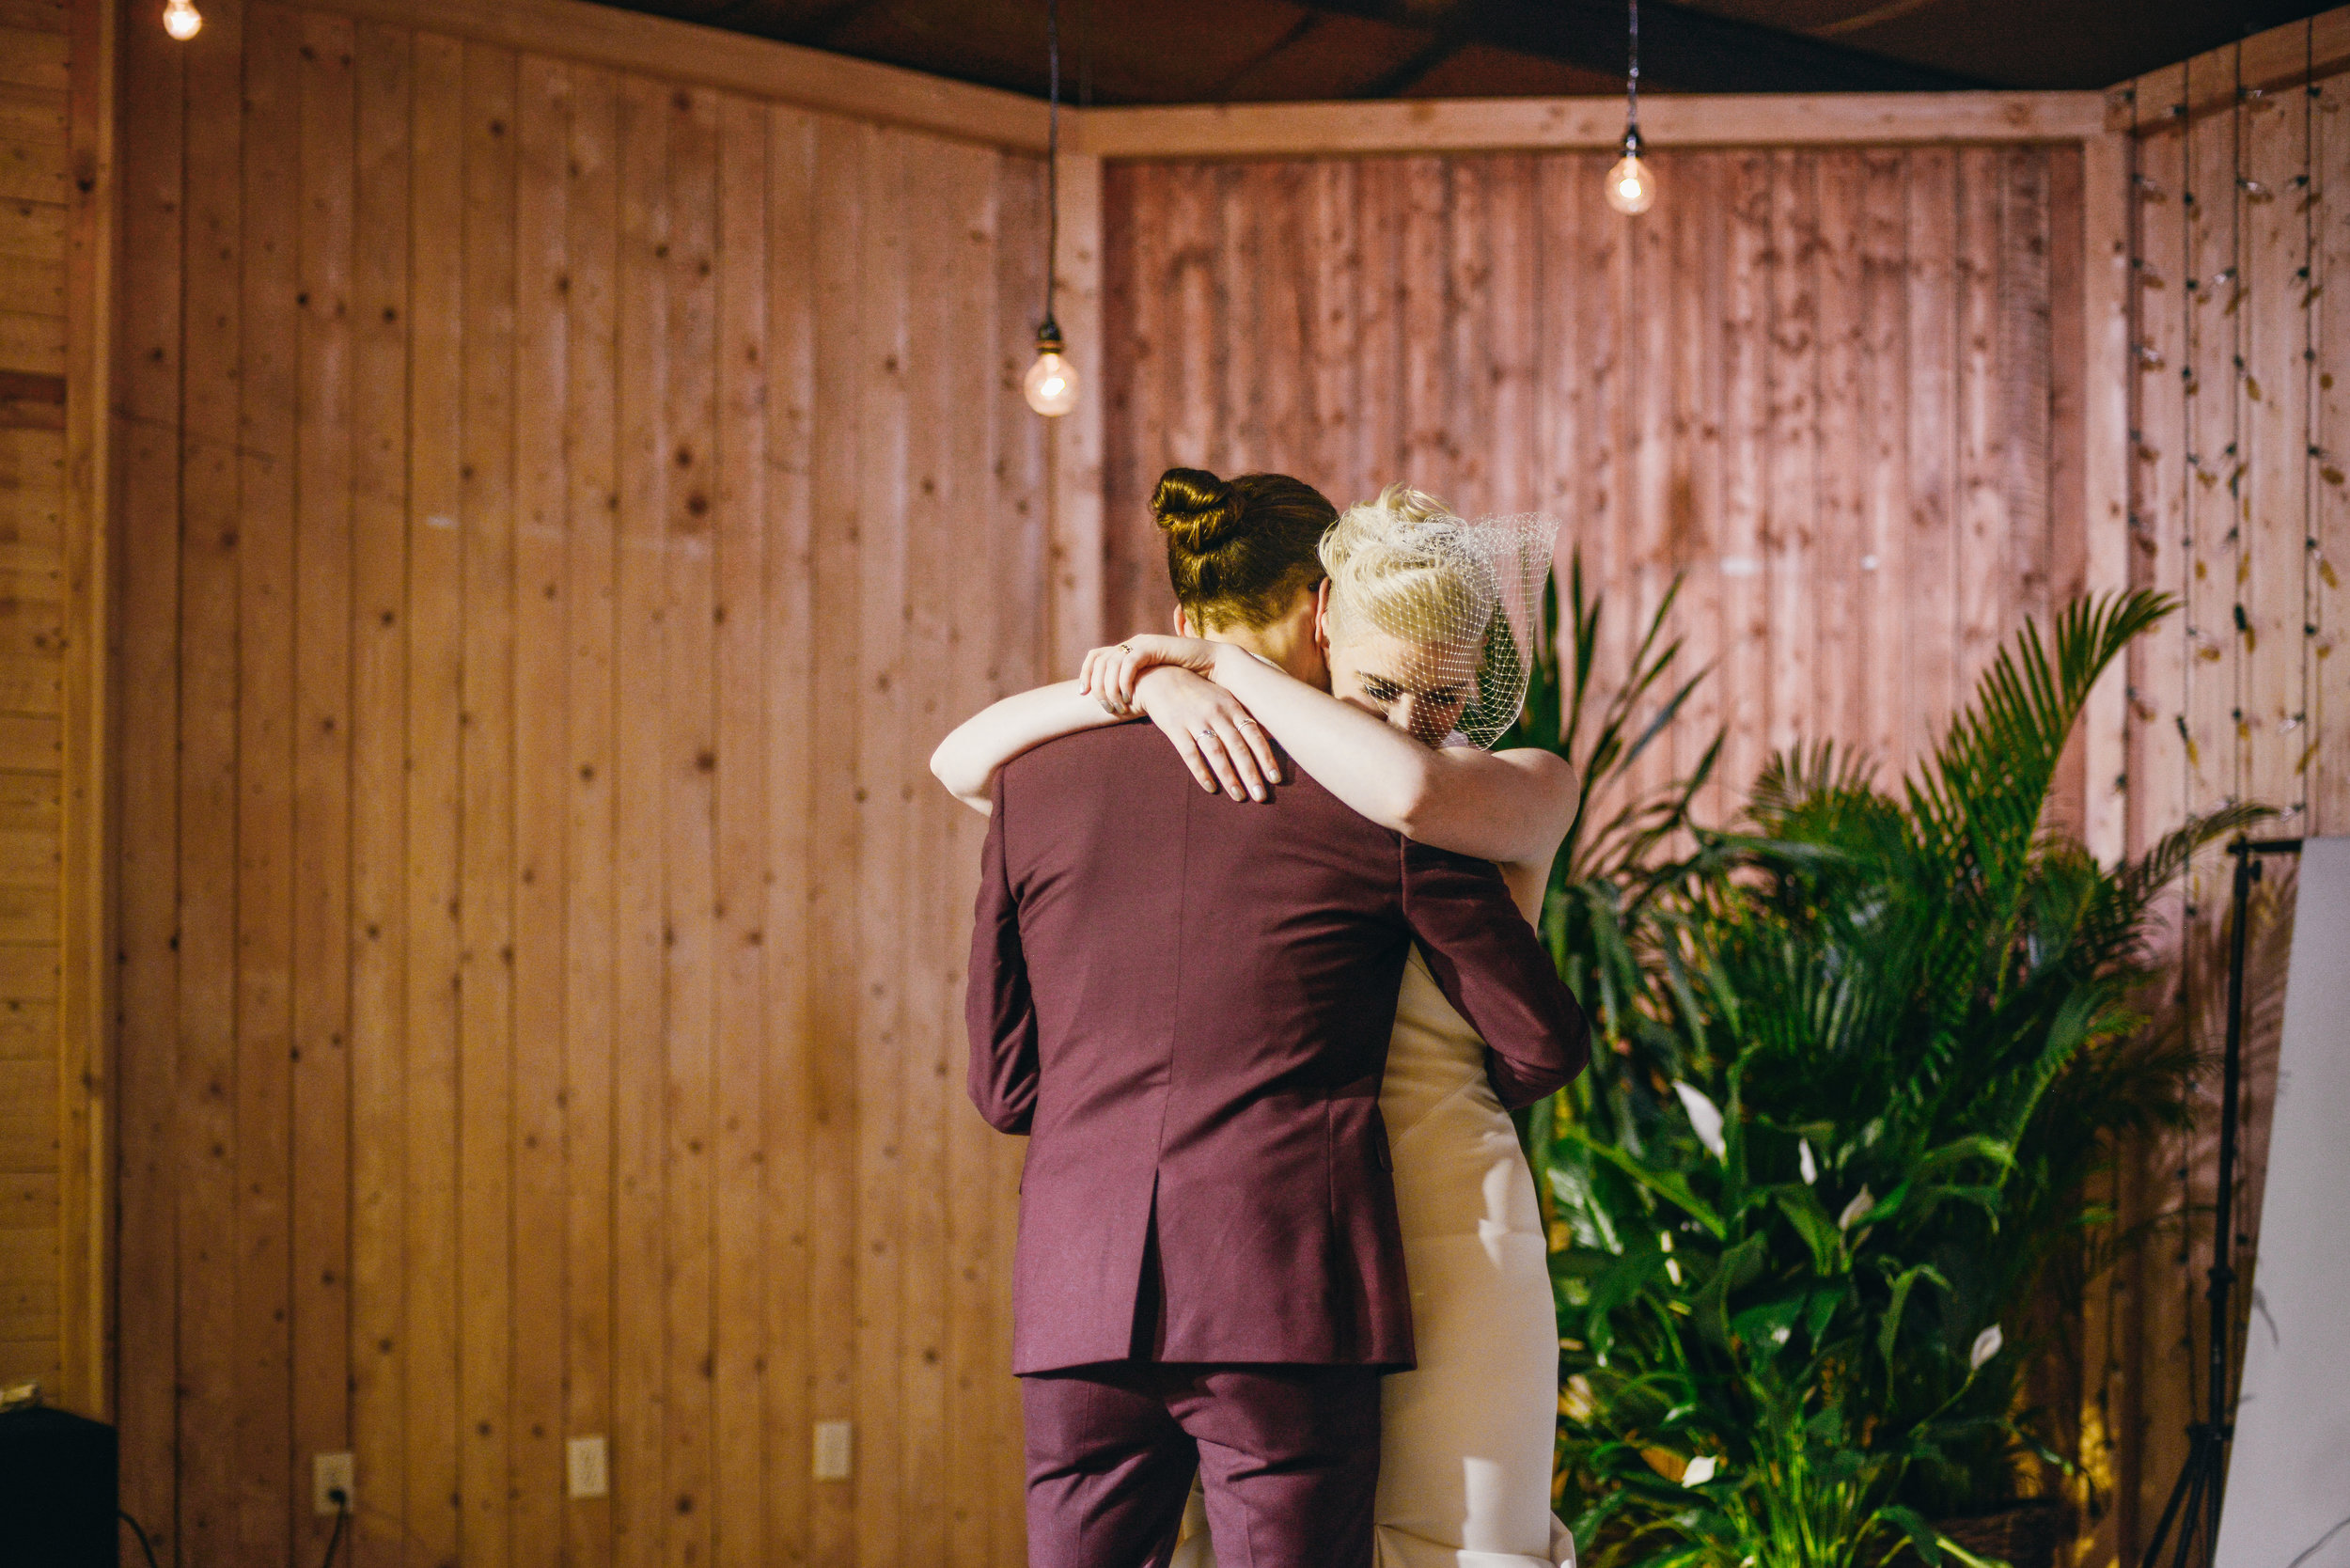 julia-hembree-photography-eden-village-church-wedding-savannah-warehouse-wedding-ivory-and-beau-bridal-boutique-savannah-florist-savannah-wedding-planner-savannah-event-design-scad-wedding-artist-wedding-savannah-funky-wedding-handmade-wedding-70.jpg